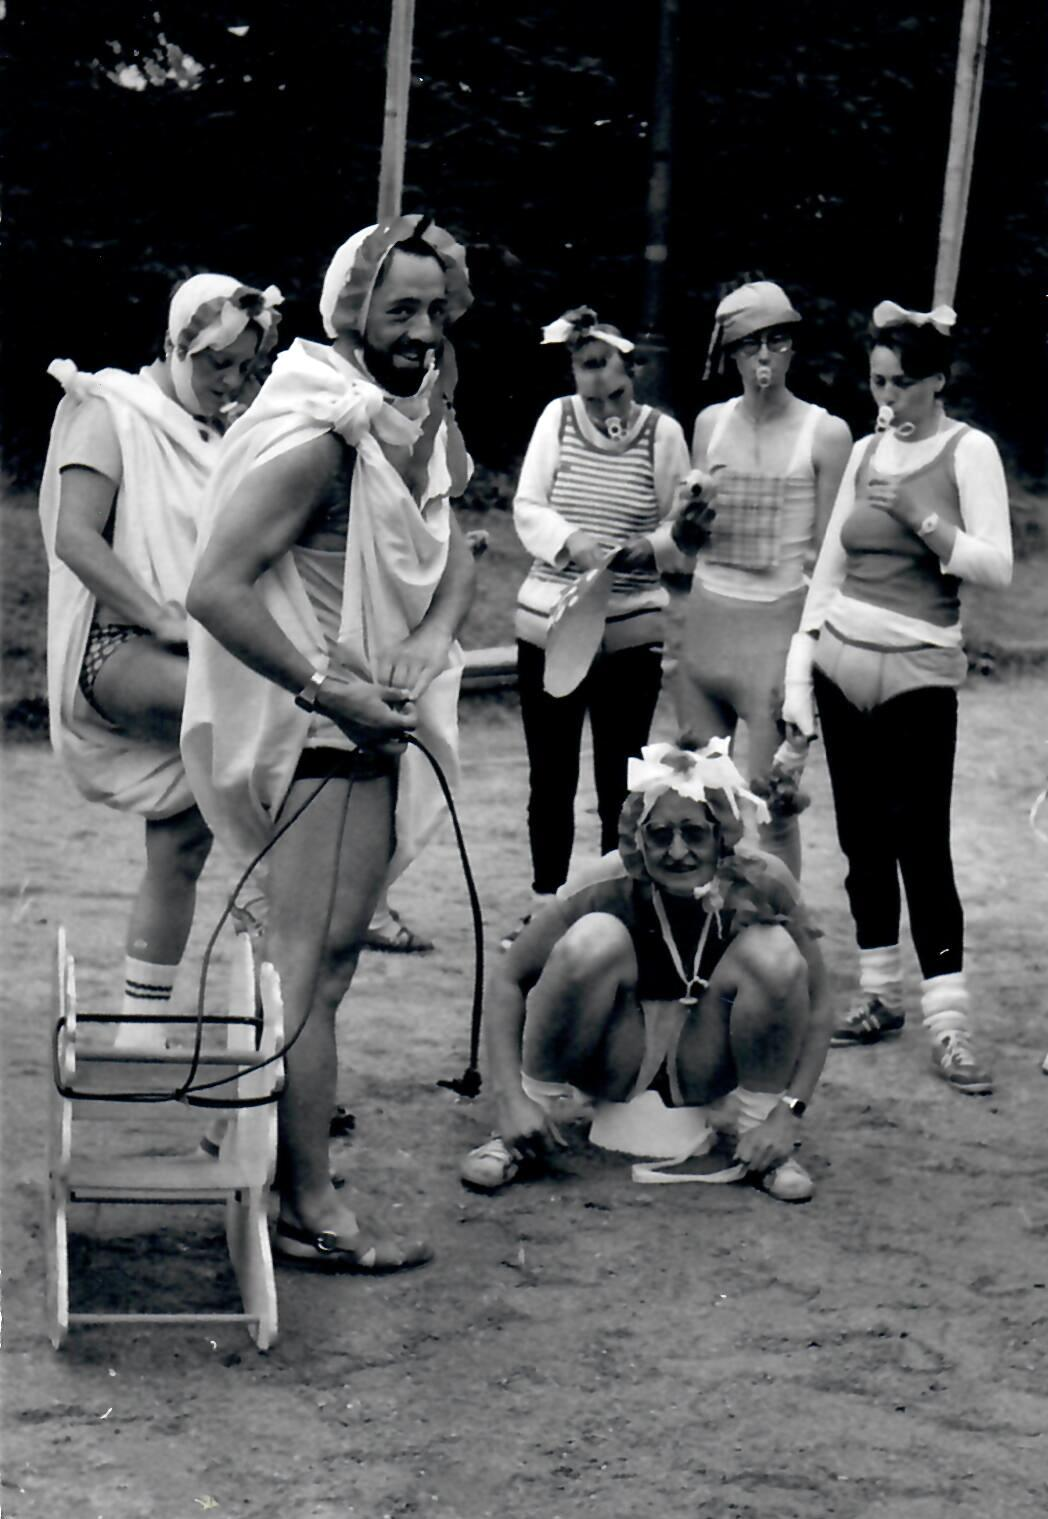 https://www.rudolfaci.cz/wp-content/uploads/2020/11/1987_Karneval_01.jpg